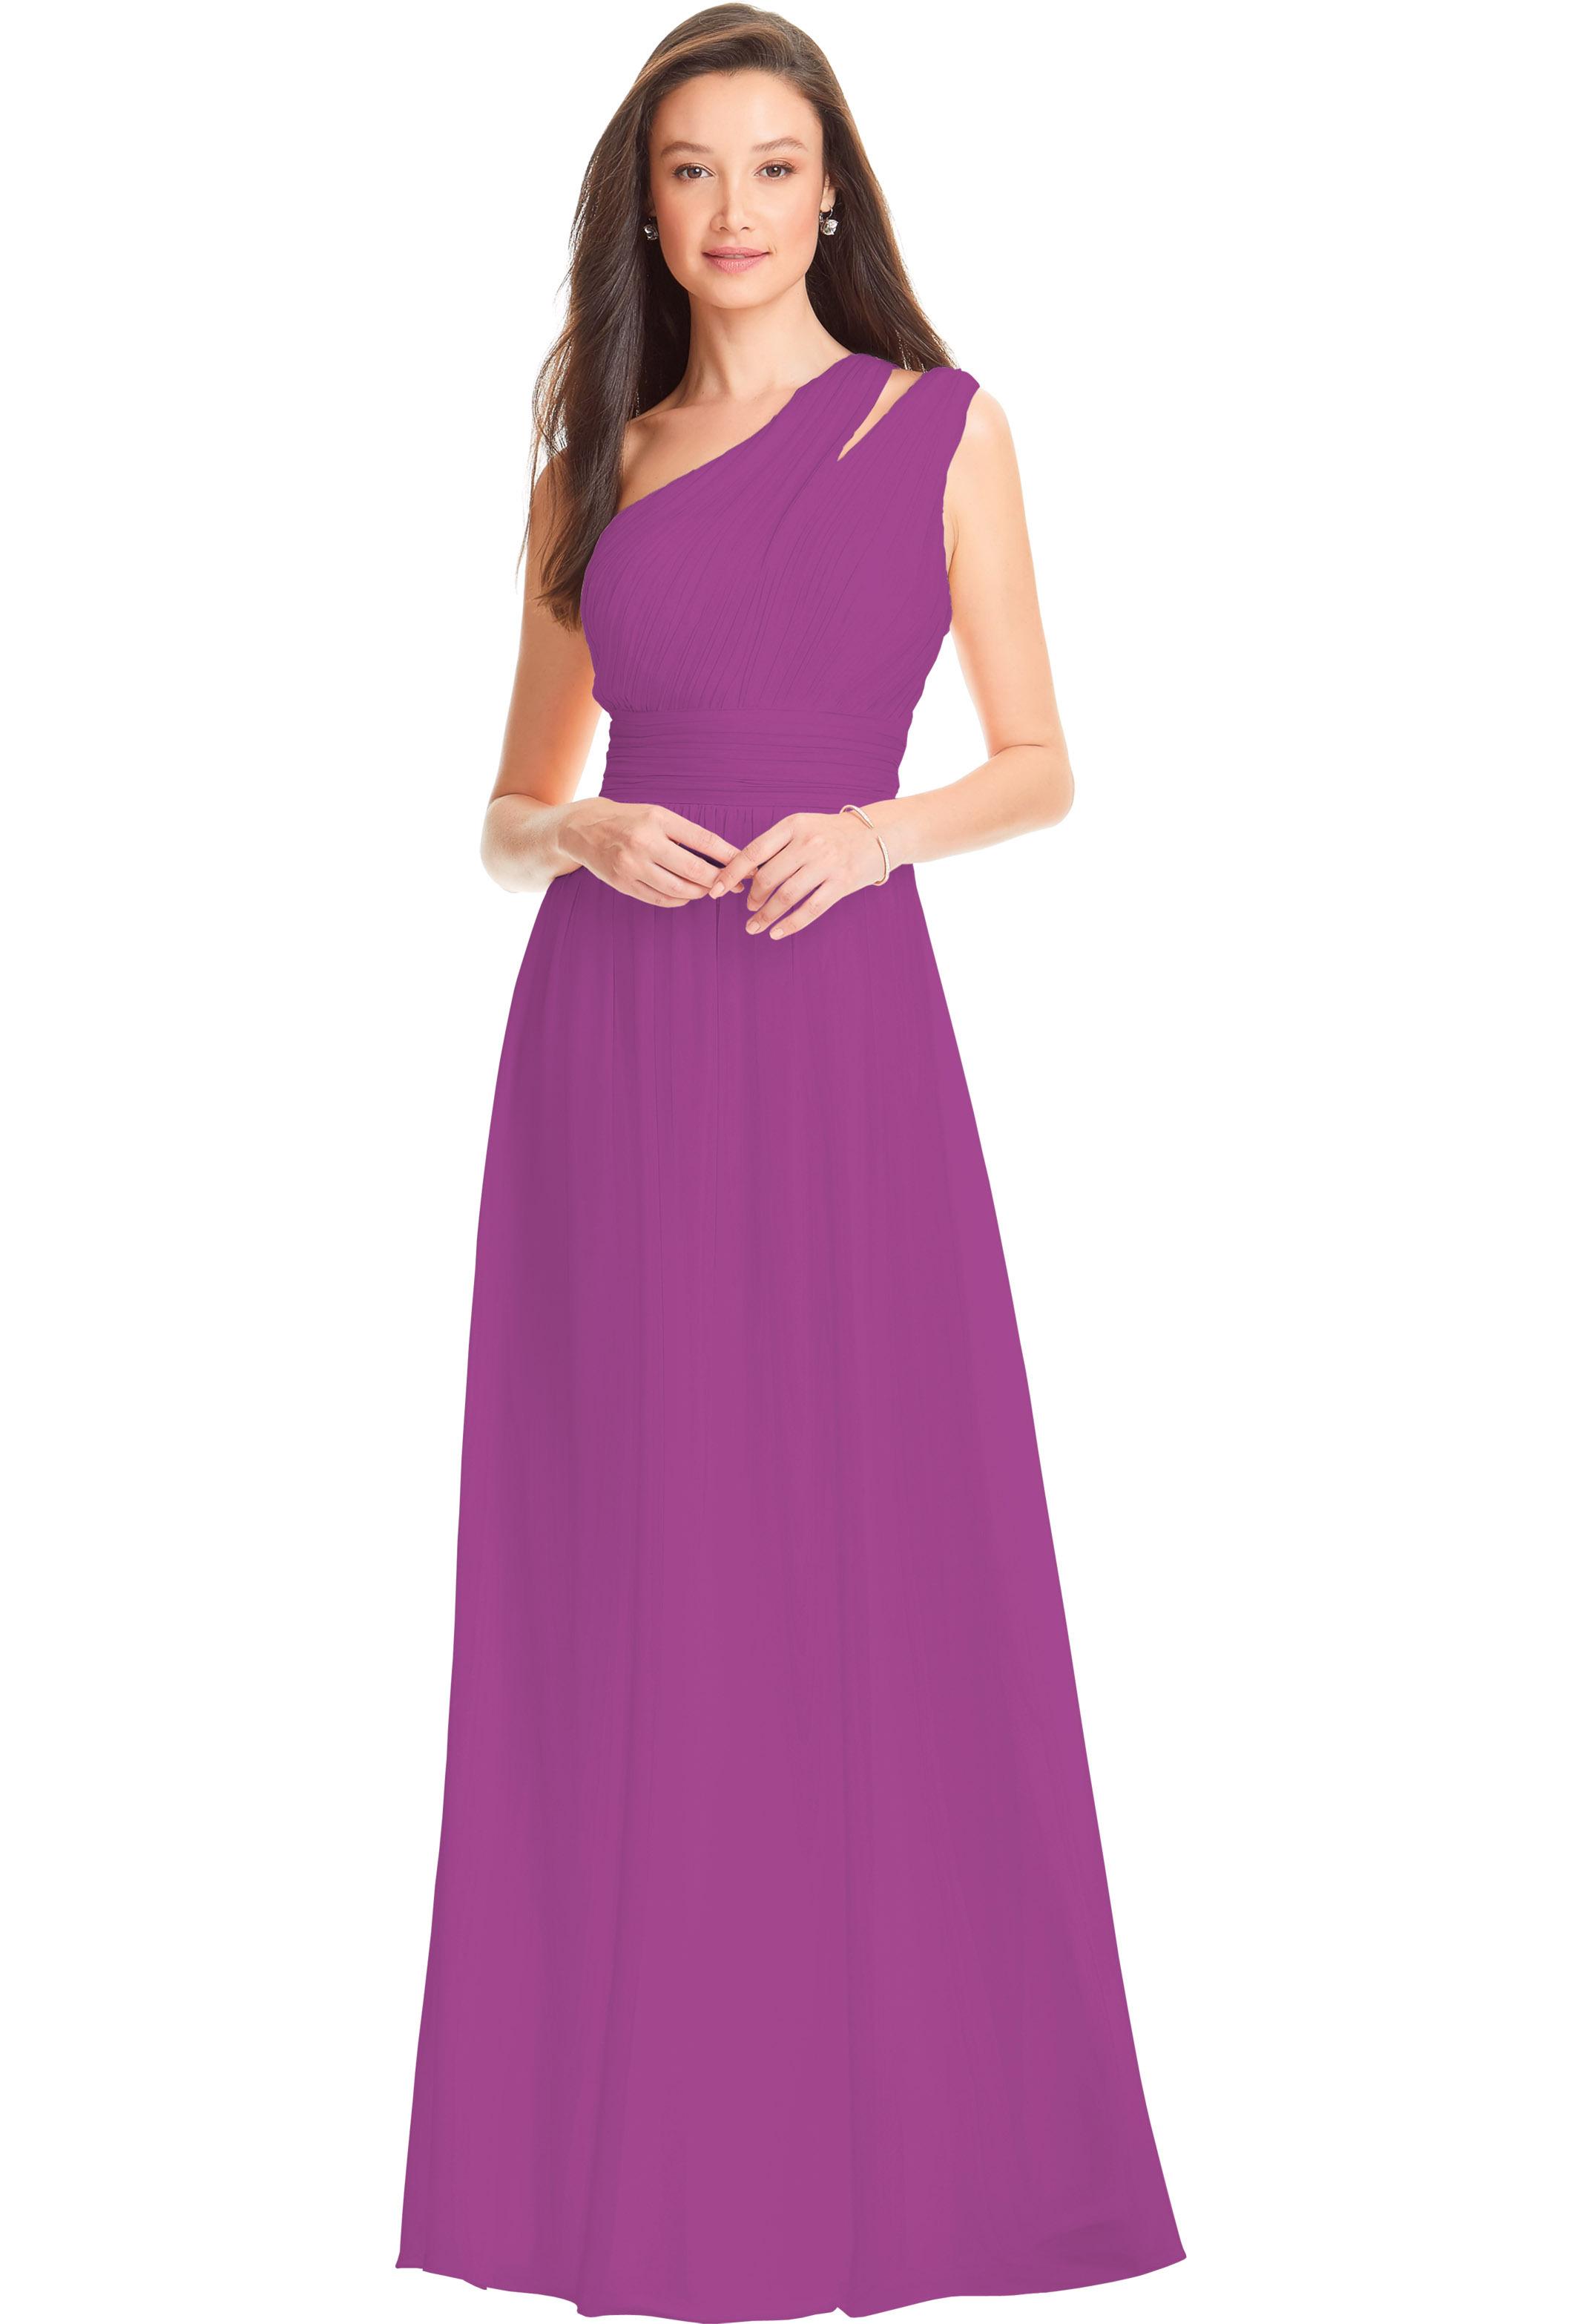 Bill Levkoff EGGPLANT Chiffon One Shoulder A-line gown, $178.00 Front